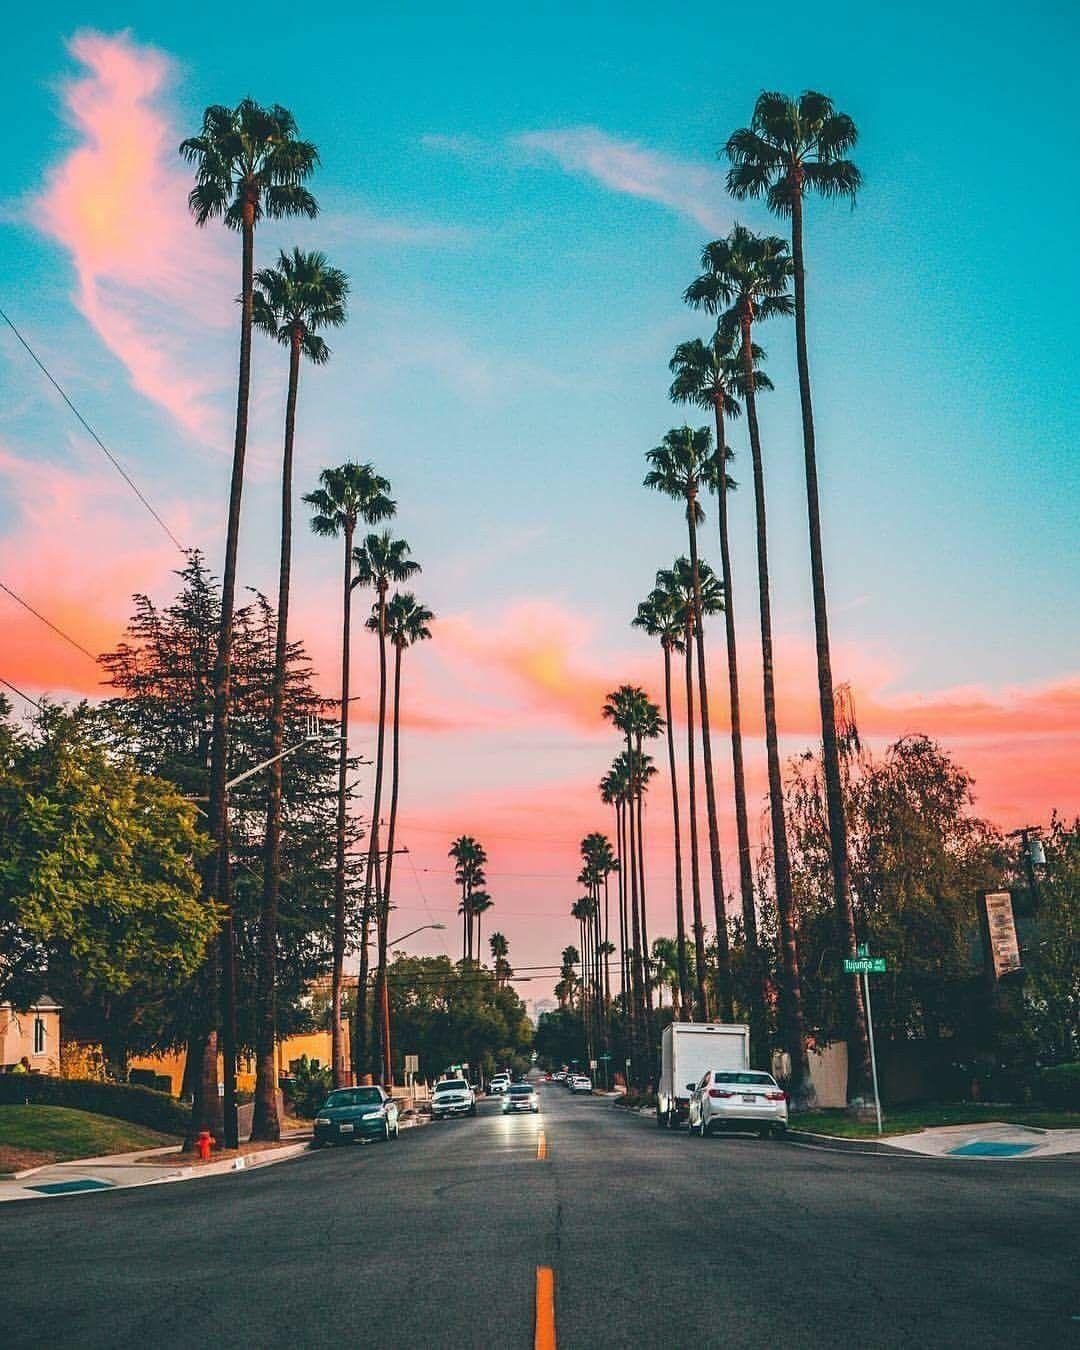 California Wallpaper Sky Aesthetic Tumblr Wallpaper